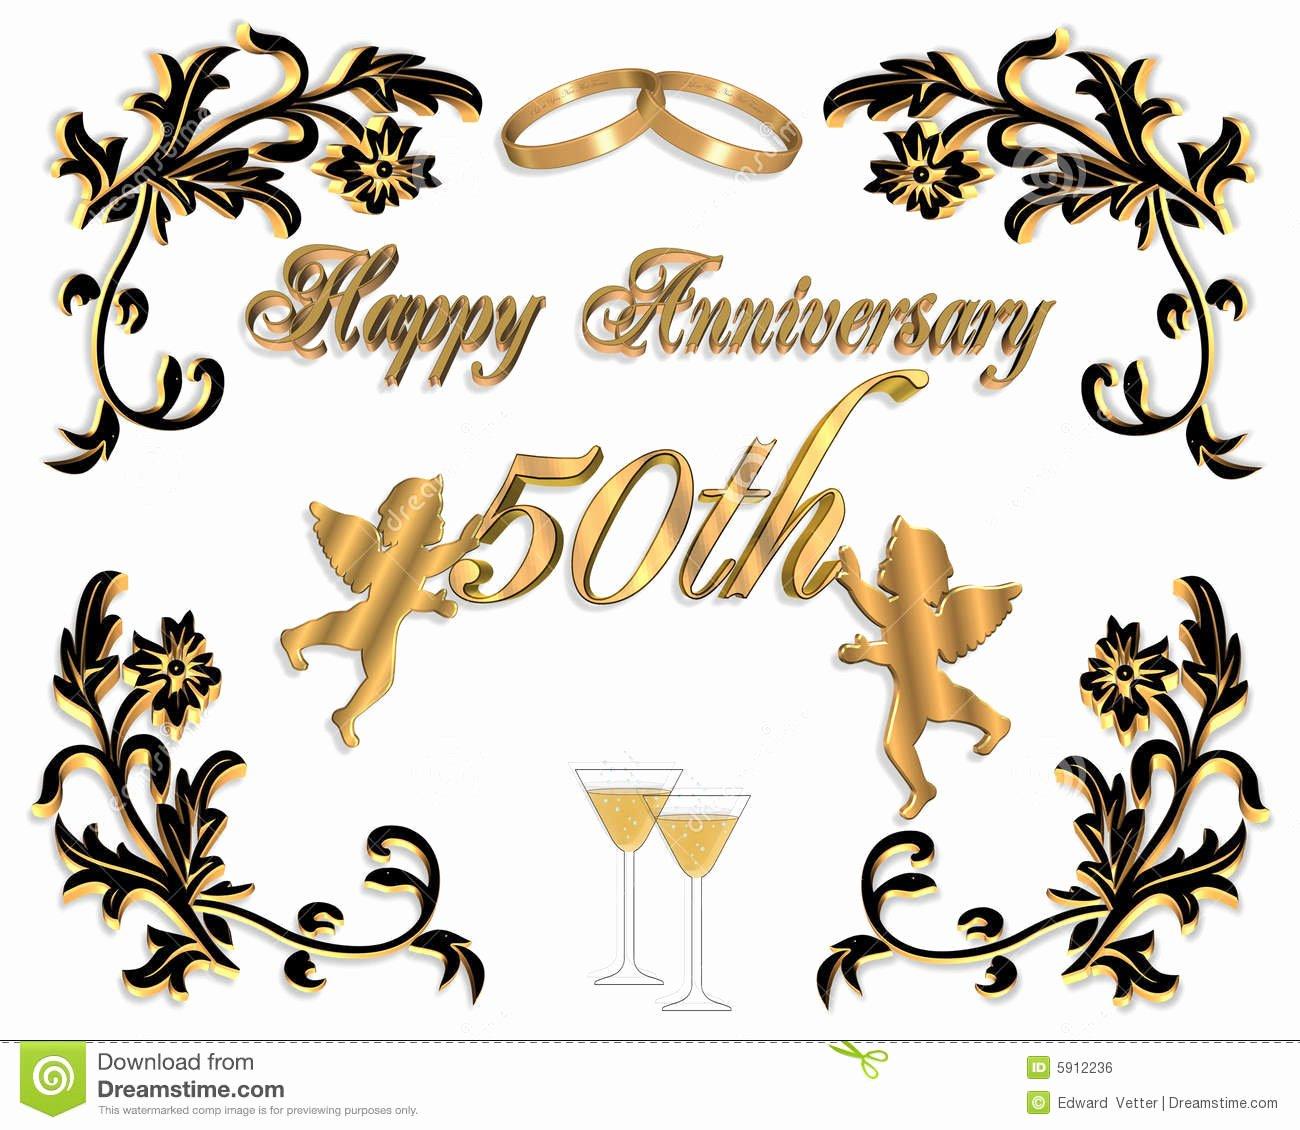 50th Anniversary Invitation Templates Free